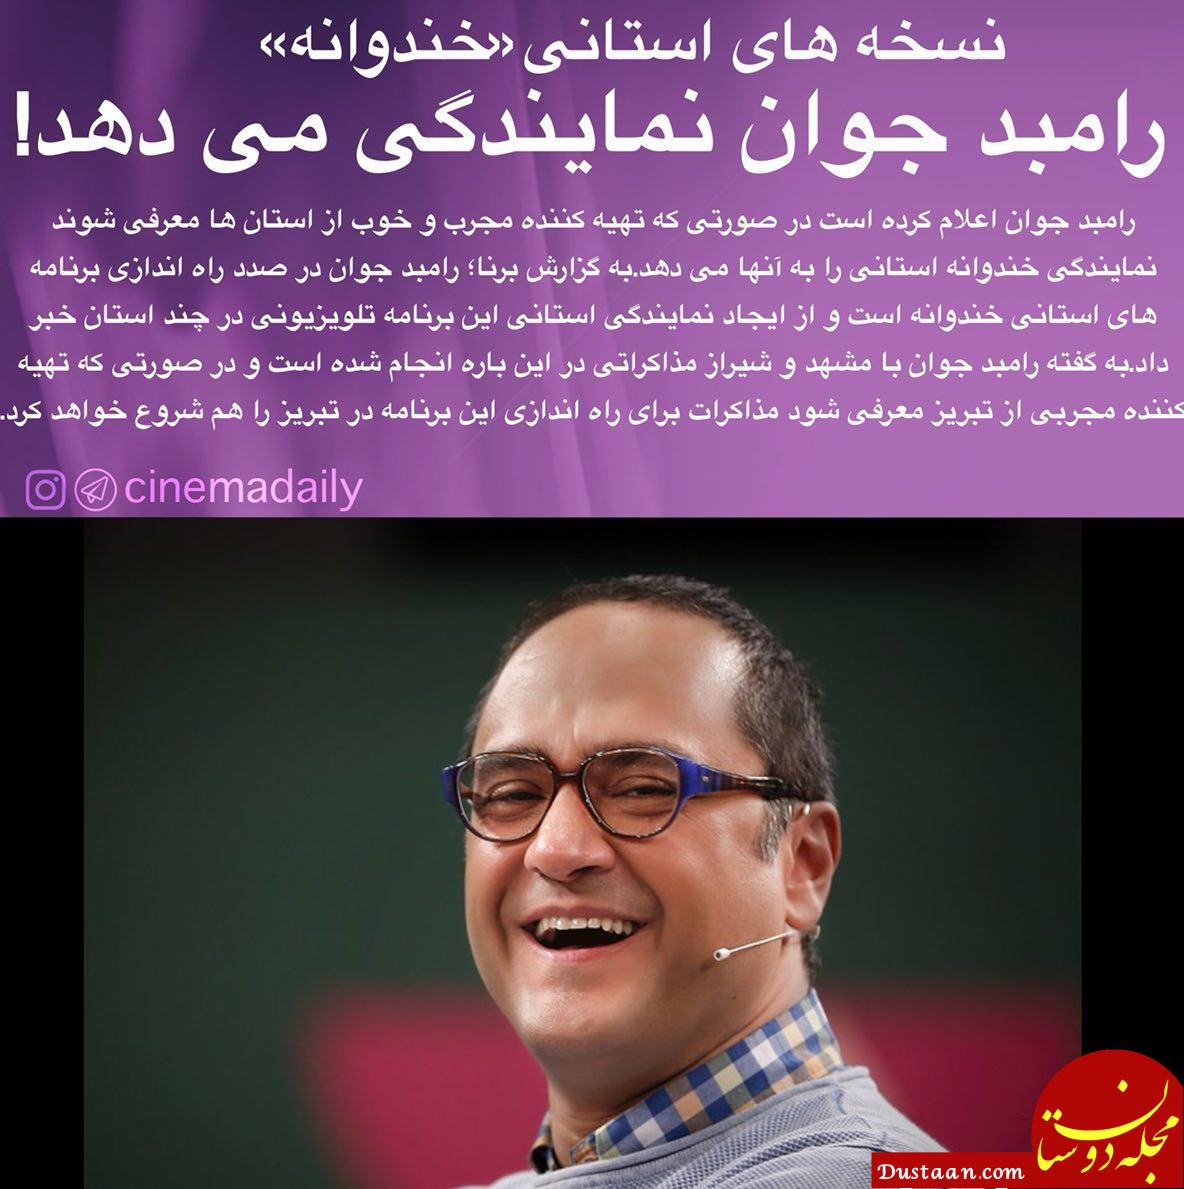 www.dustaan.com رامبد جوان نمایندگی می دهد!